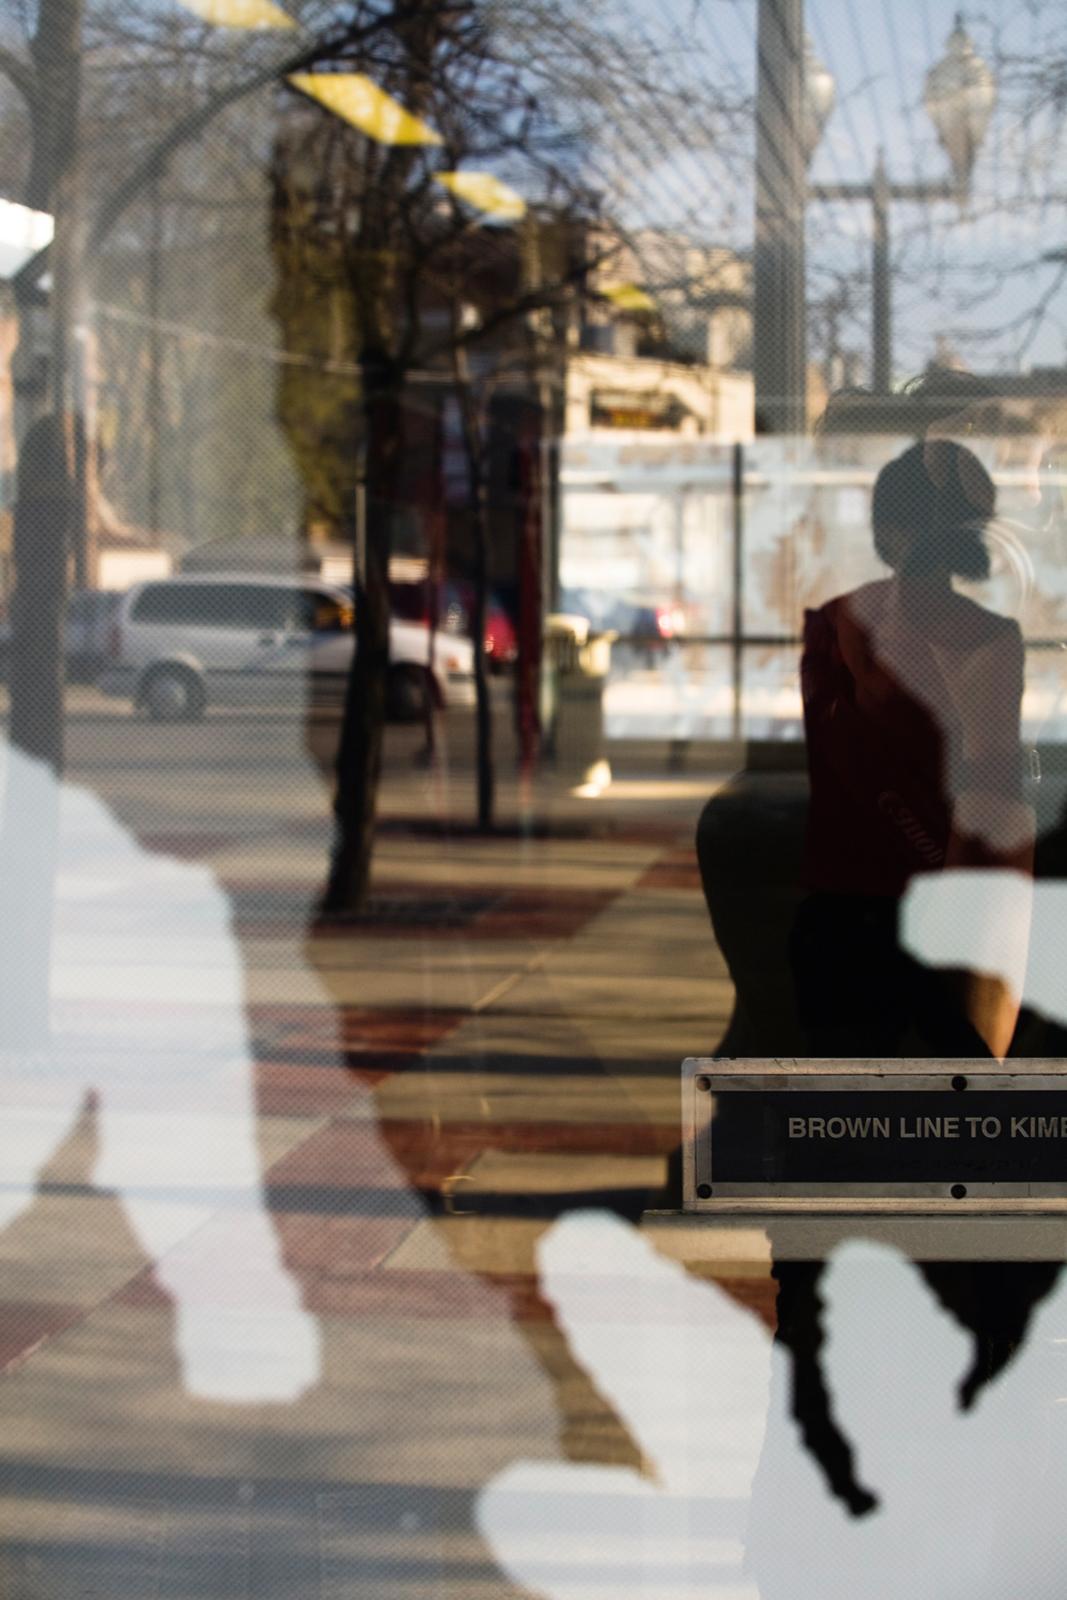 rothenberg_2007_shadowscreens_007.jpg